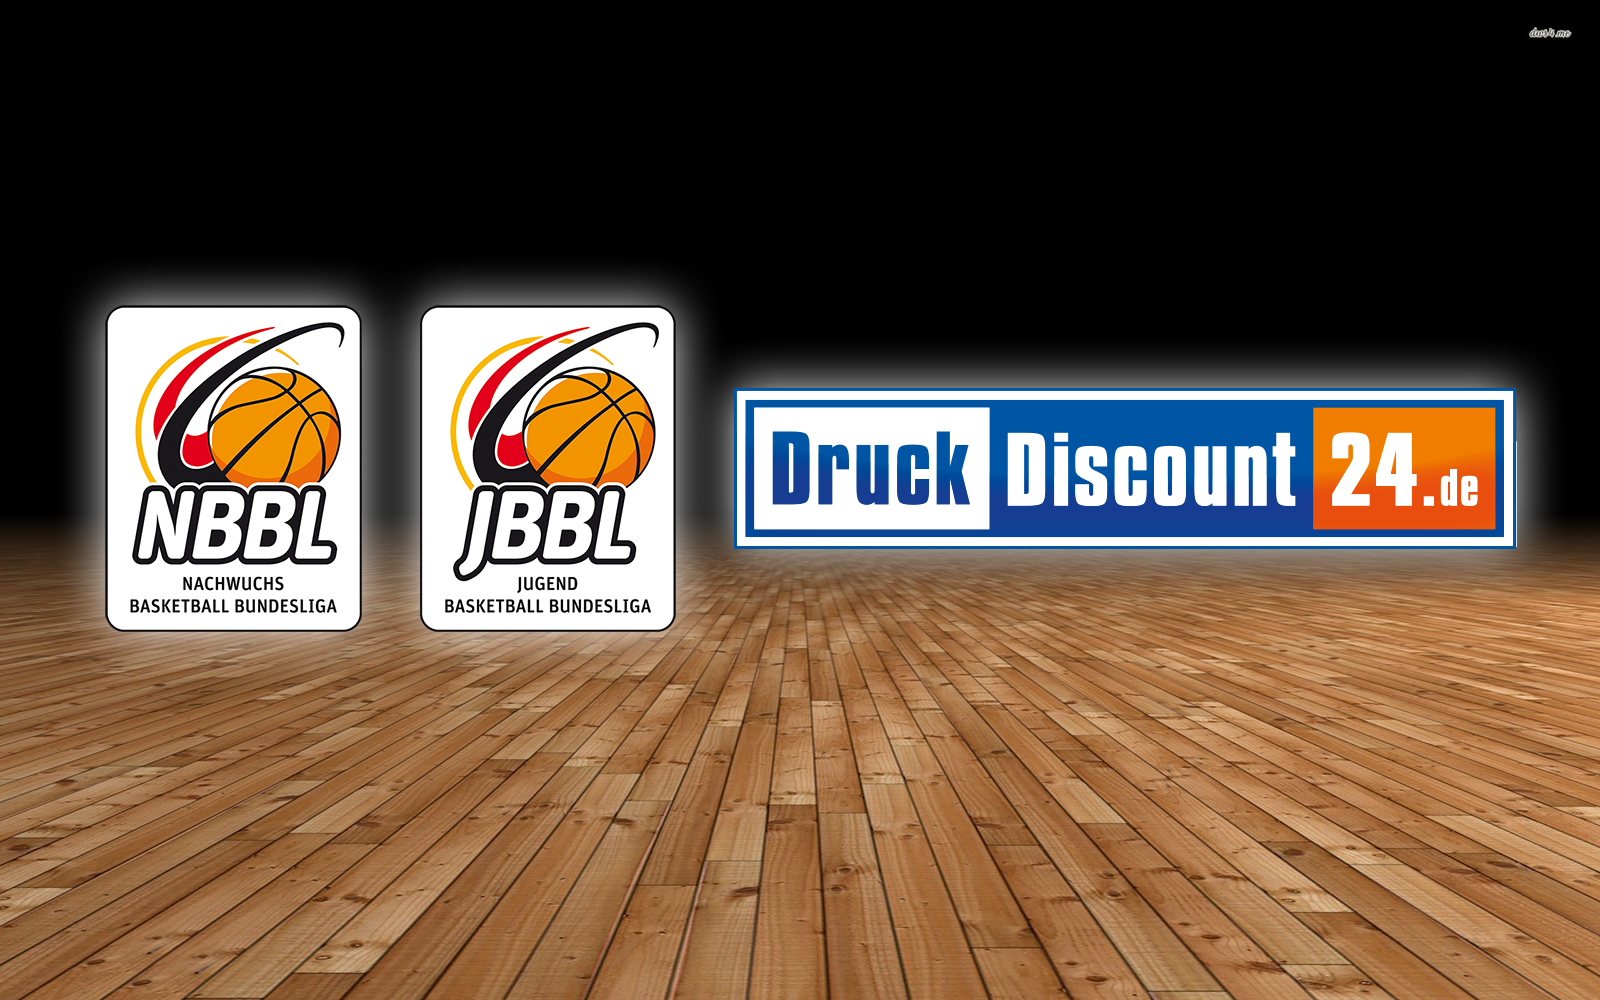 NBBL/JBBL: DruckDiscount24.de offizieller Druckpartner